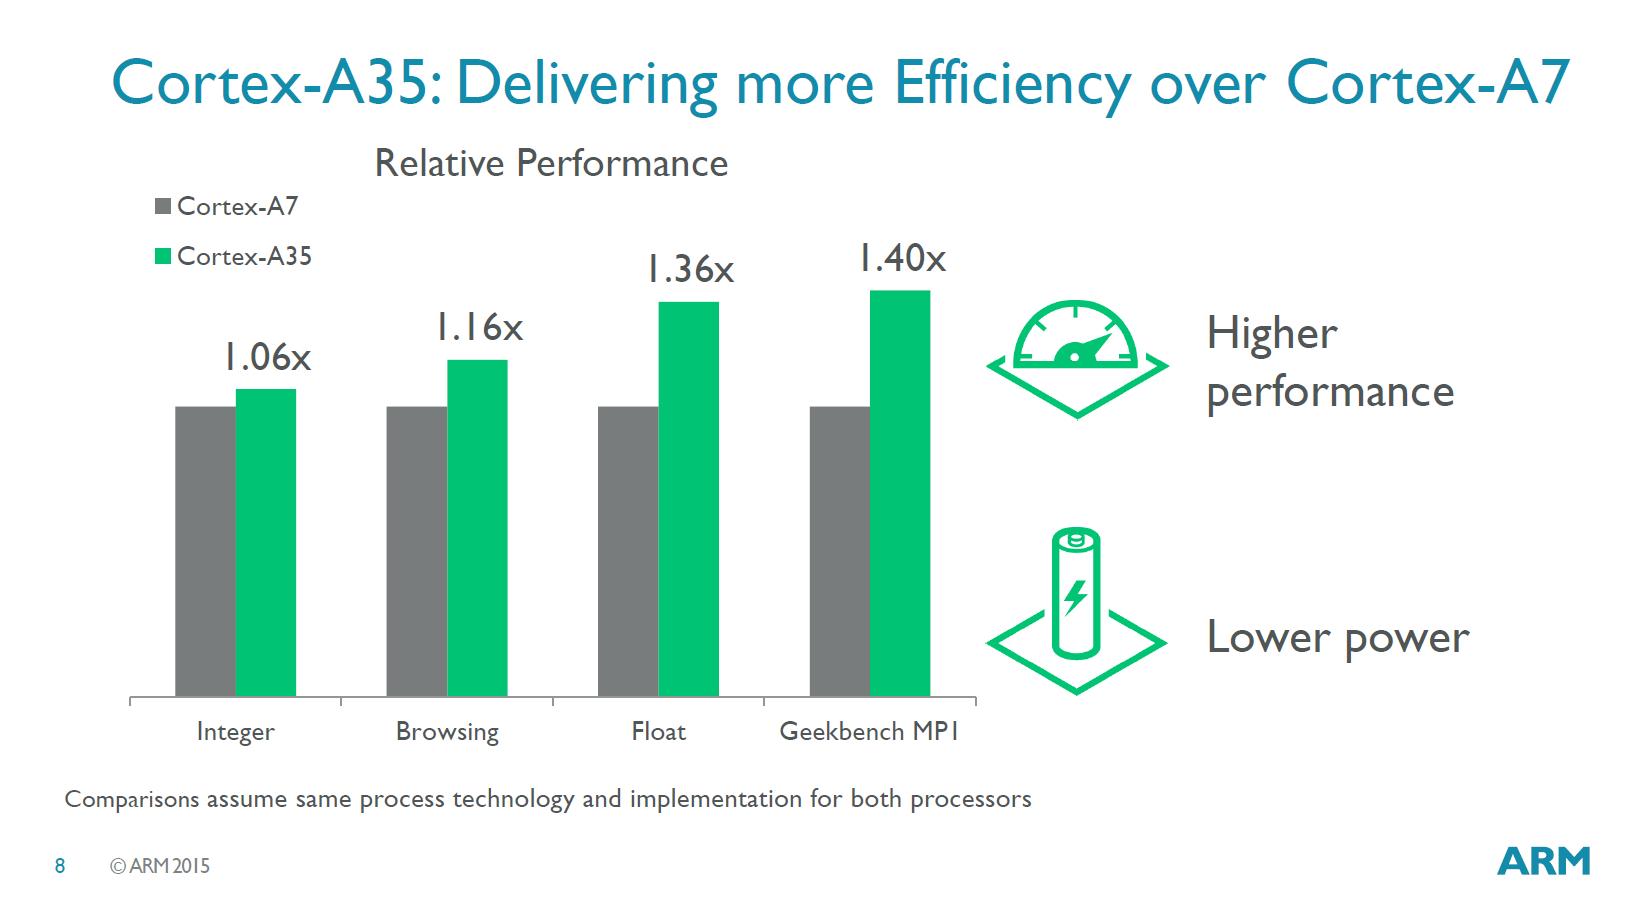 ARM Announces New Cortex-A35 CPU - Ultra-High Efficiency For